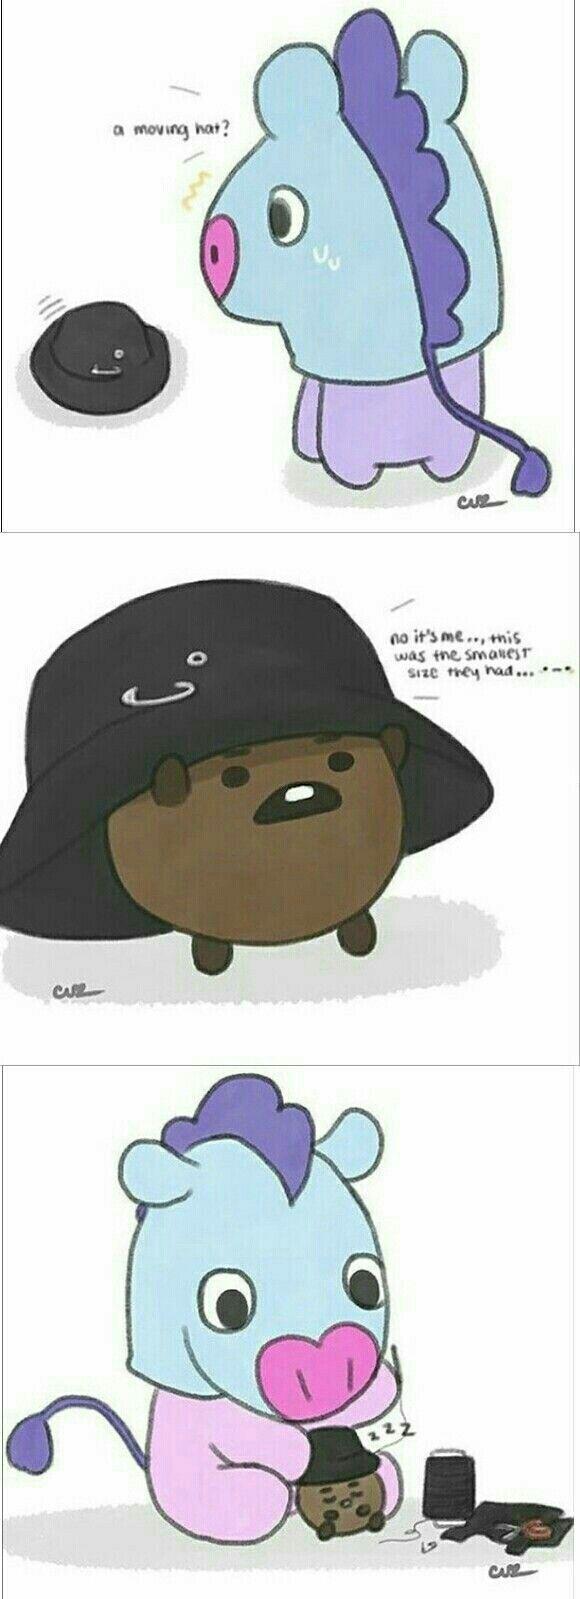 Yoonseok/sope  💮fanarts 💮 - 10